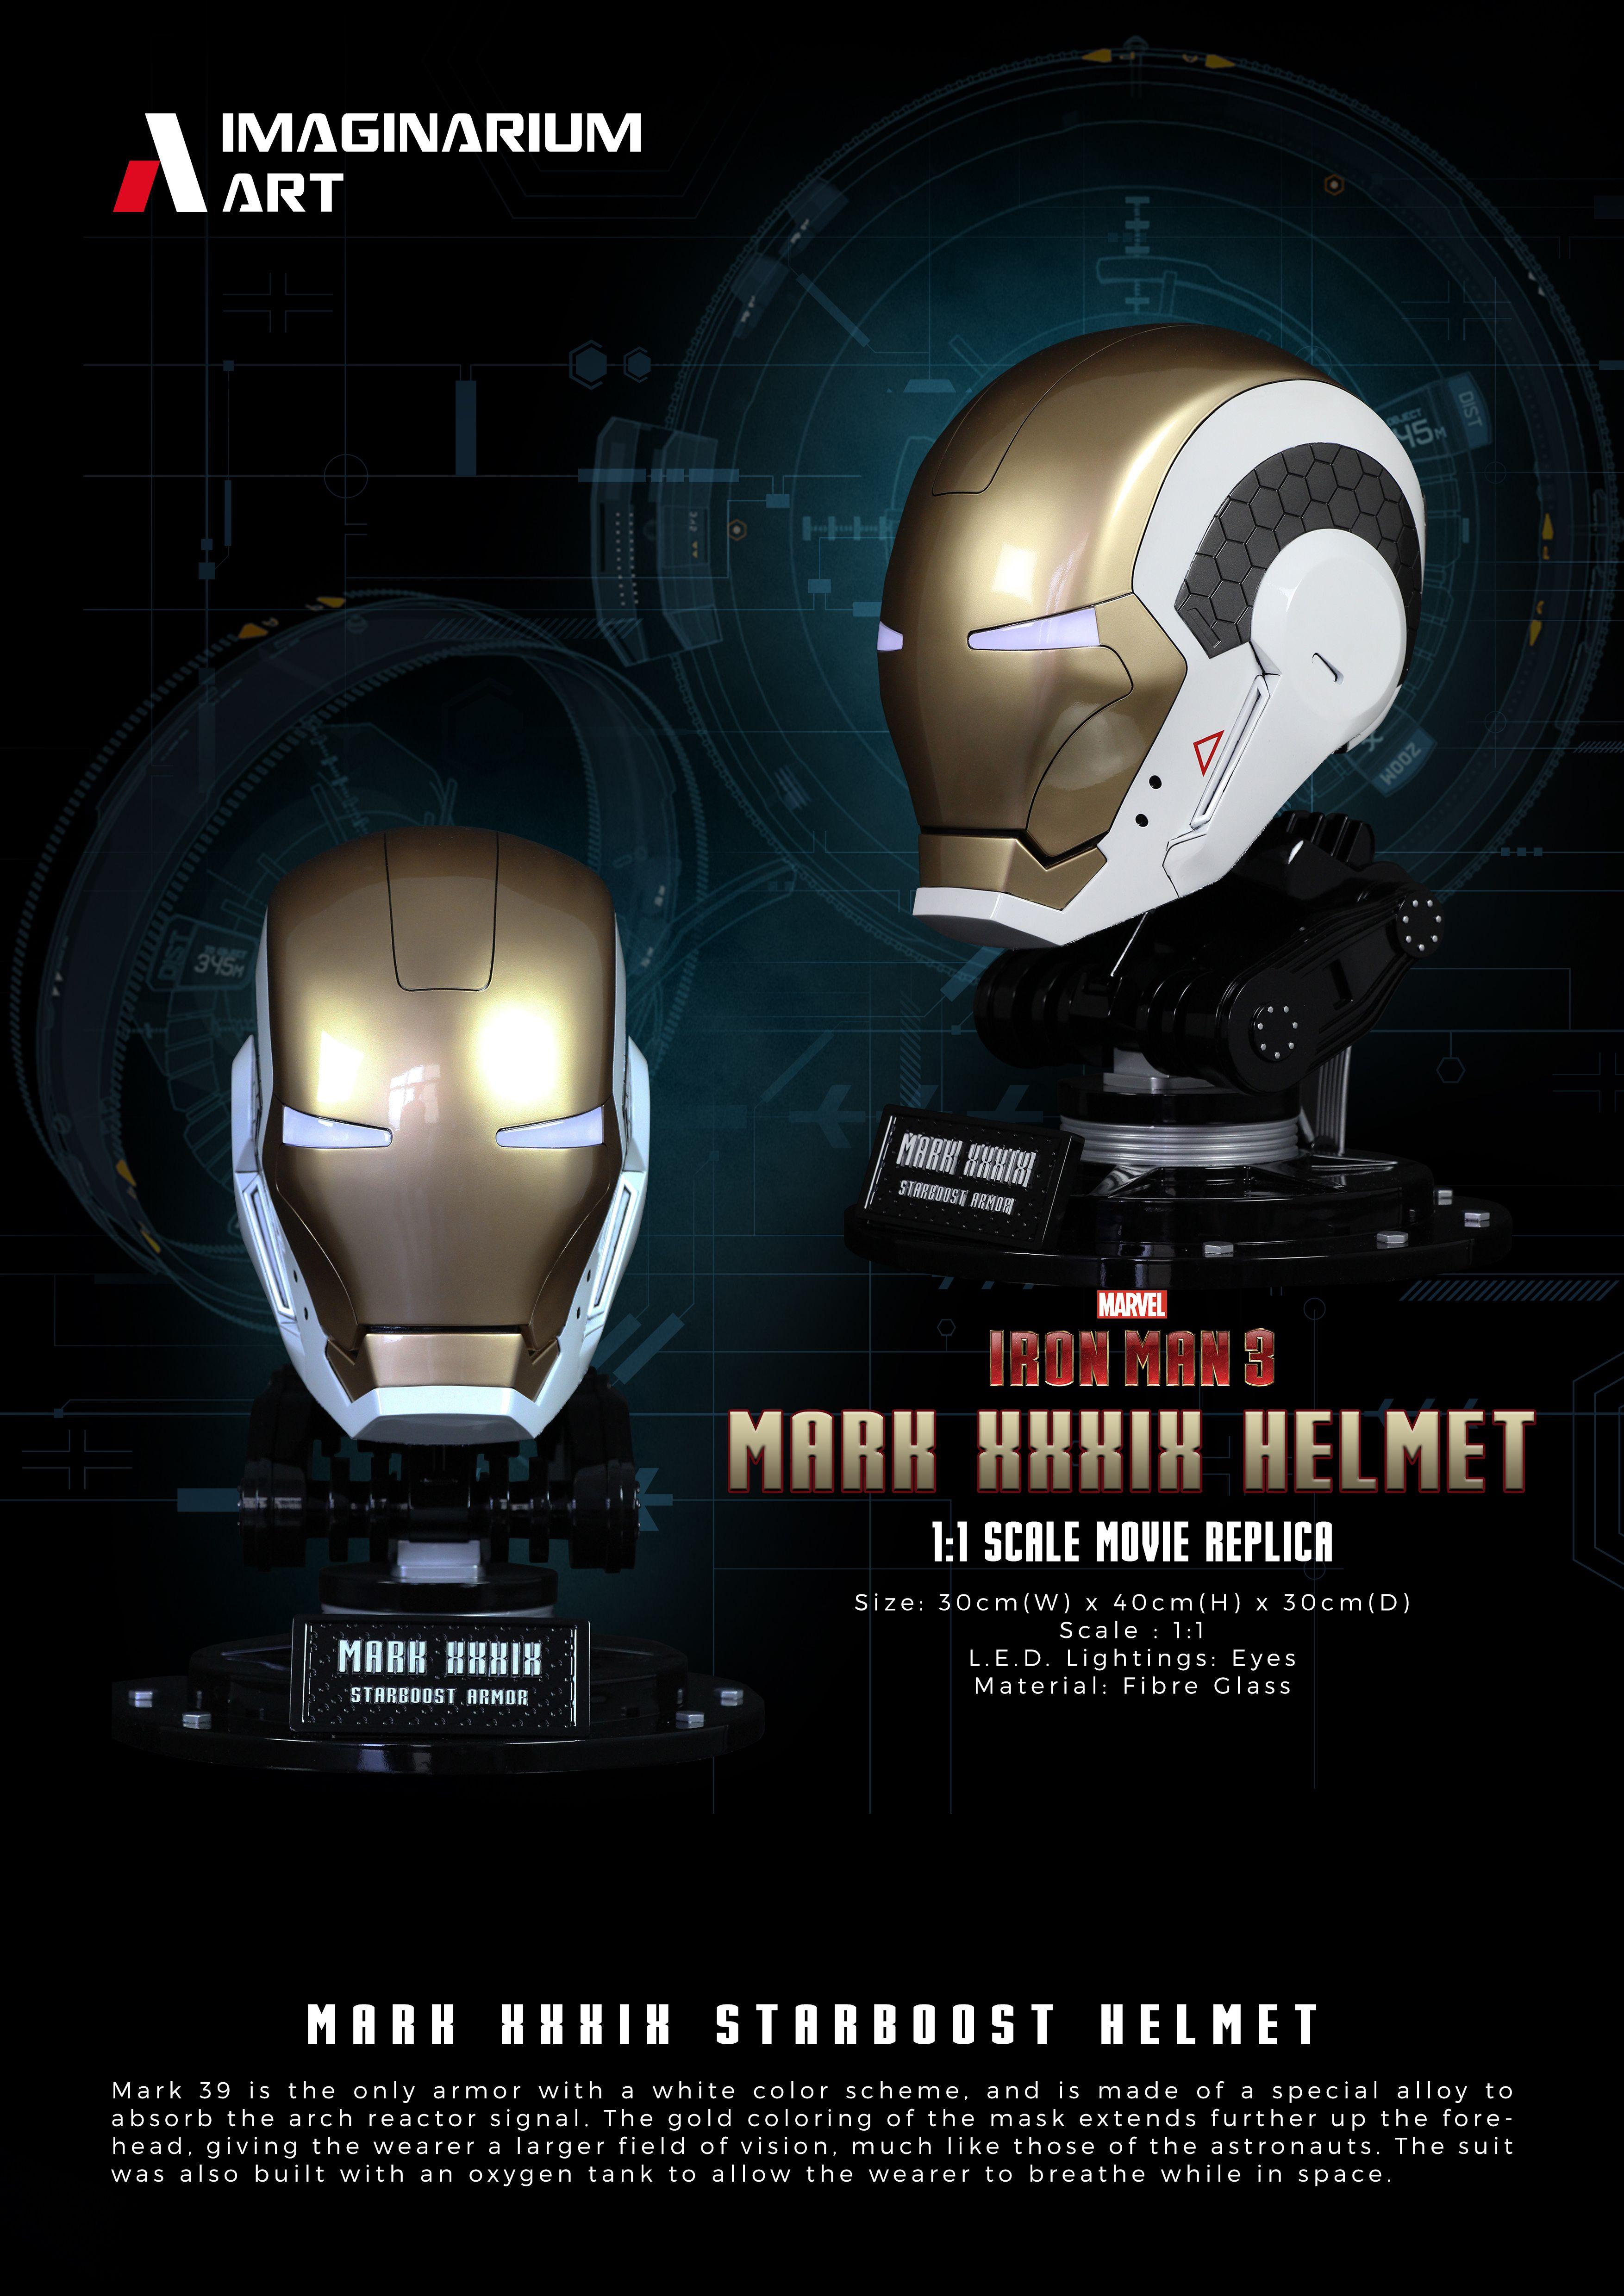 Iron Man Mark 39 1 1 Helmet By Imaginarium Art Art Marvel Iron Man Movie Replica